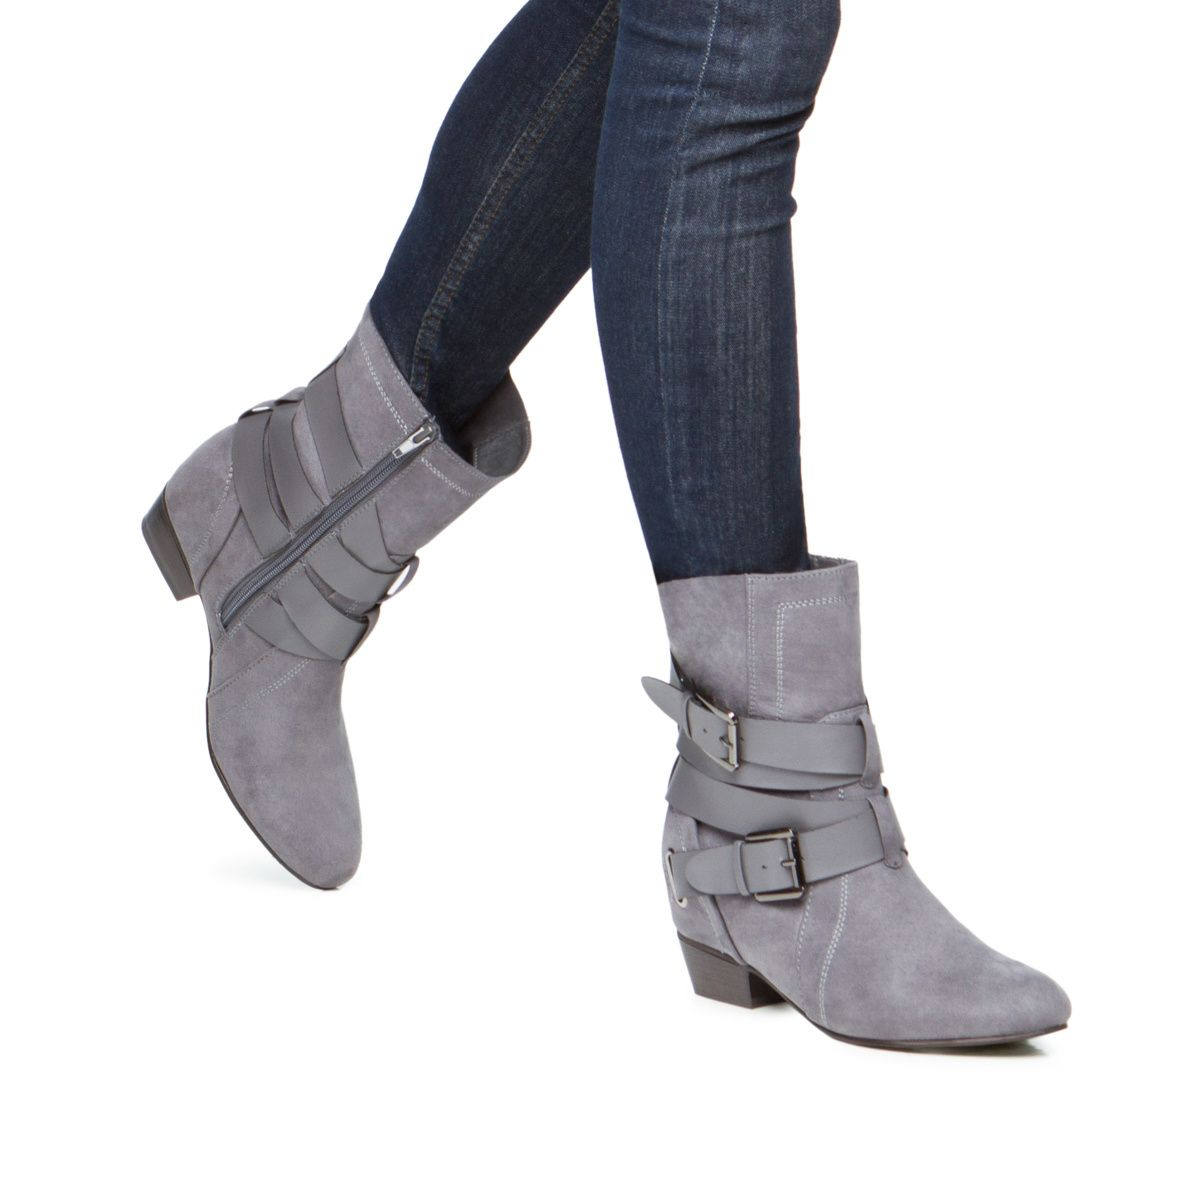 Kathleen - ShoeDazzle